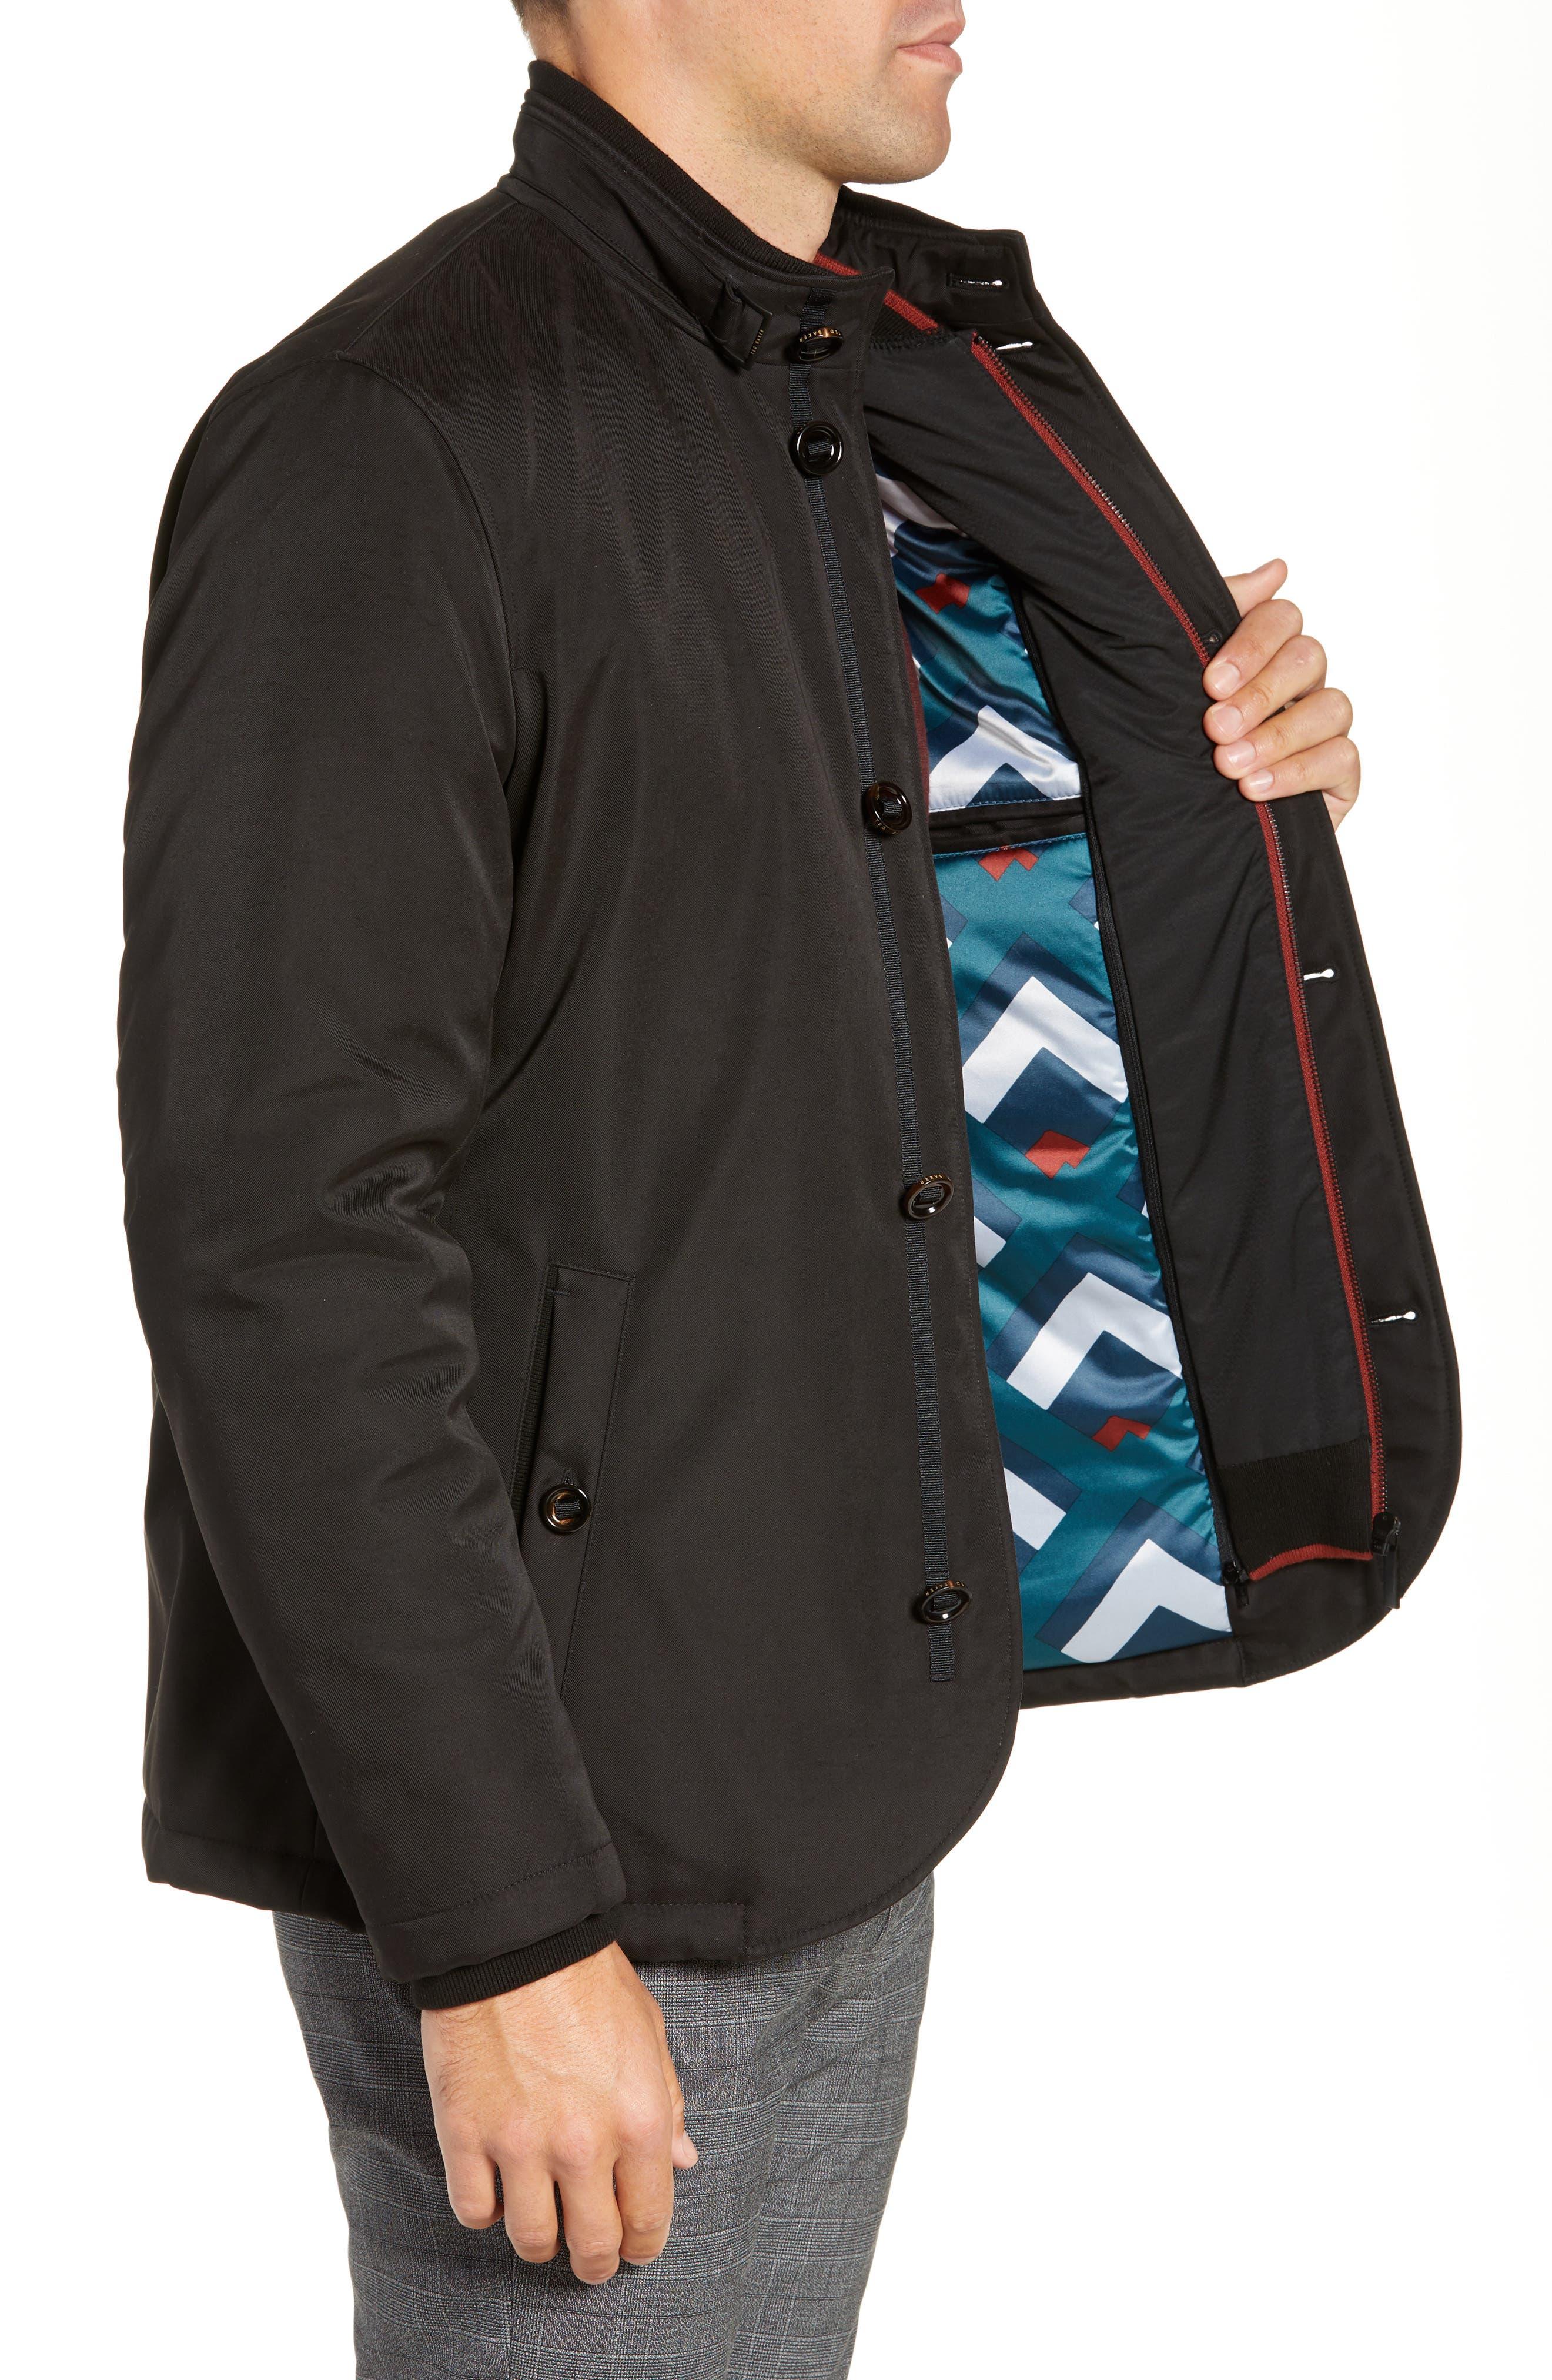 Dral Slim Fit Bib Layer Jacket,                             Alternate thumbnail 3, color,                             BLACK